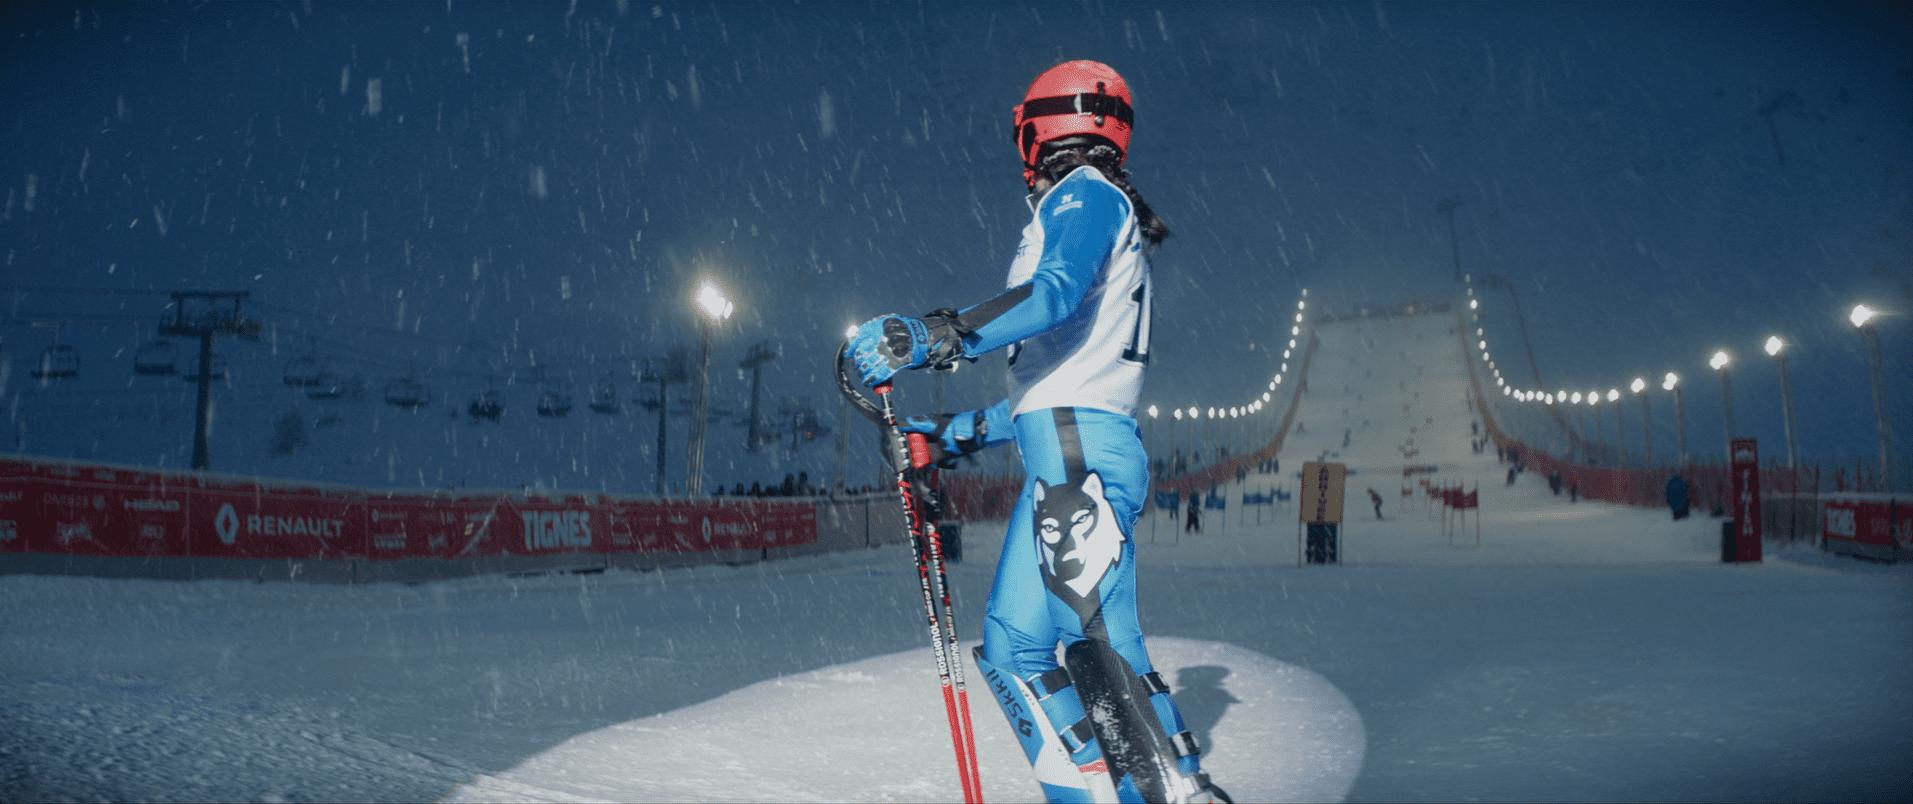 Film Review: Slalom